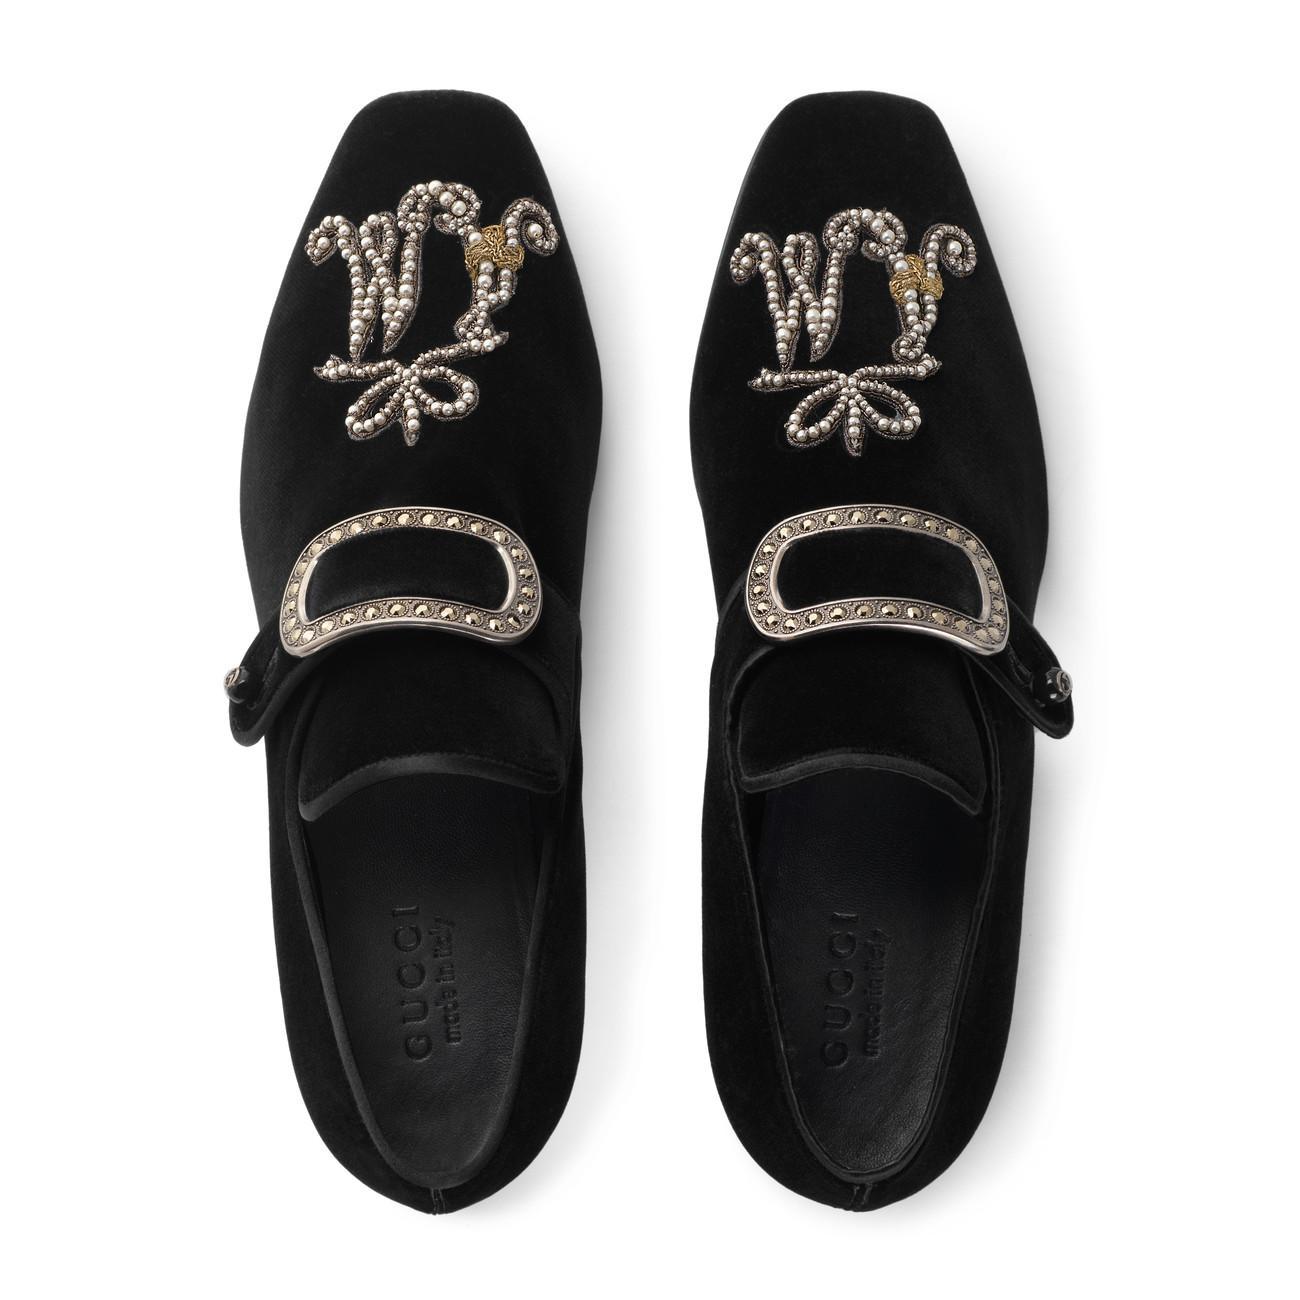 9d429d689fe Gucci - Black Velvet Loafer With Jewel Buckle for Men - Lyst. View  fullscreen